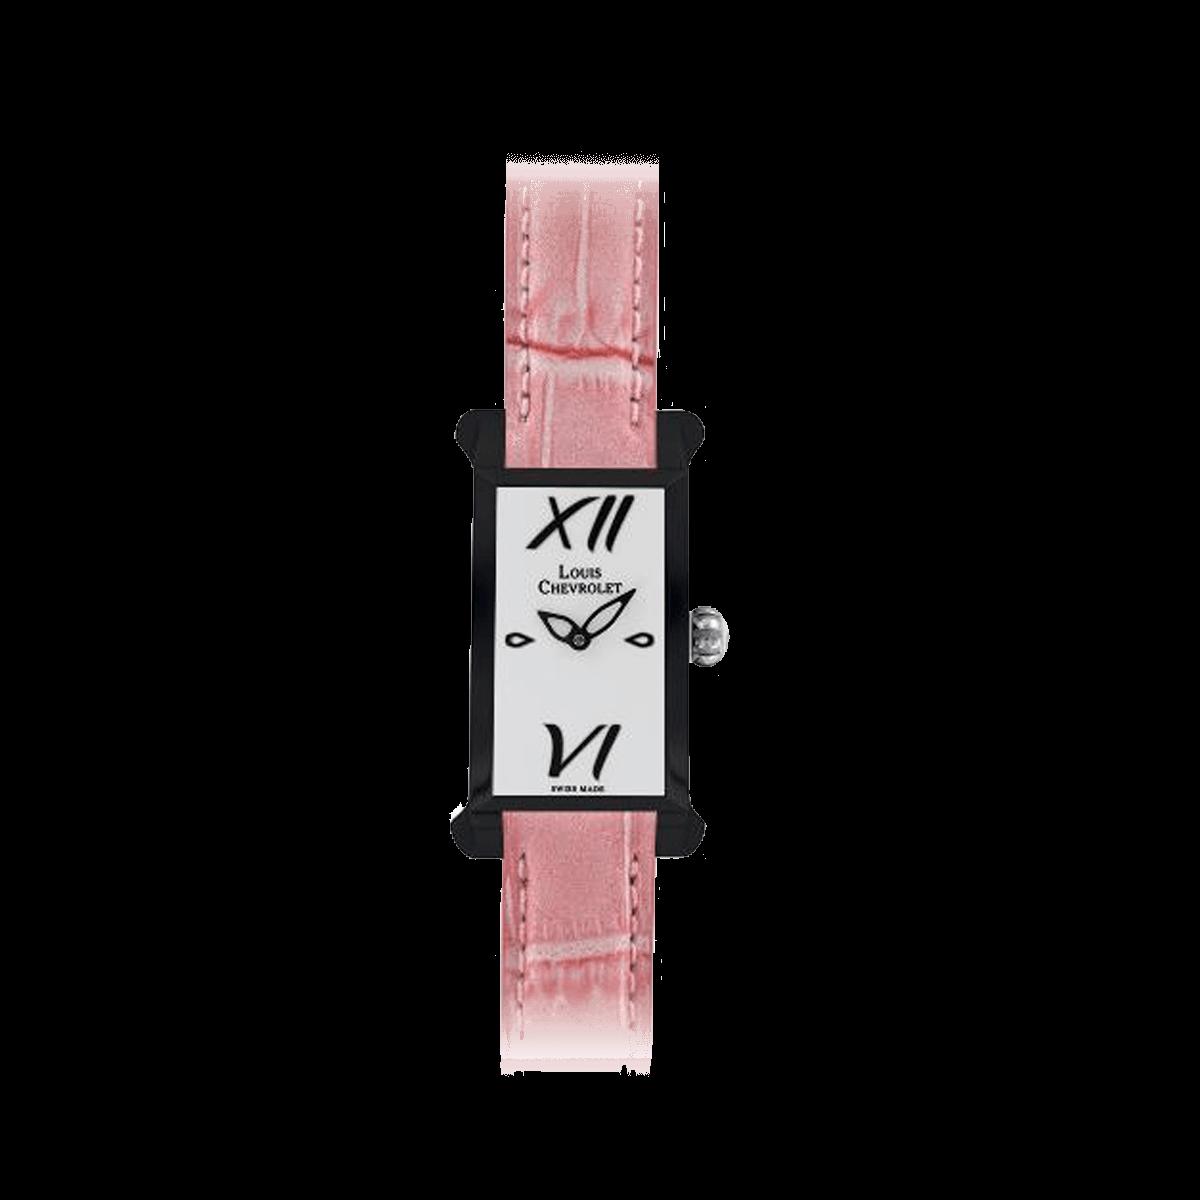 Louis Chevrolet 10500 – Pohanka & co. – hodinky a klenoty